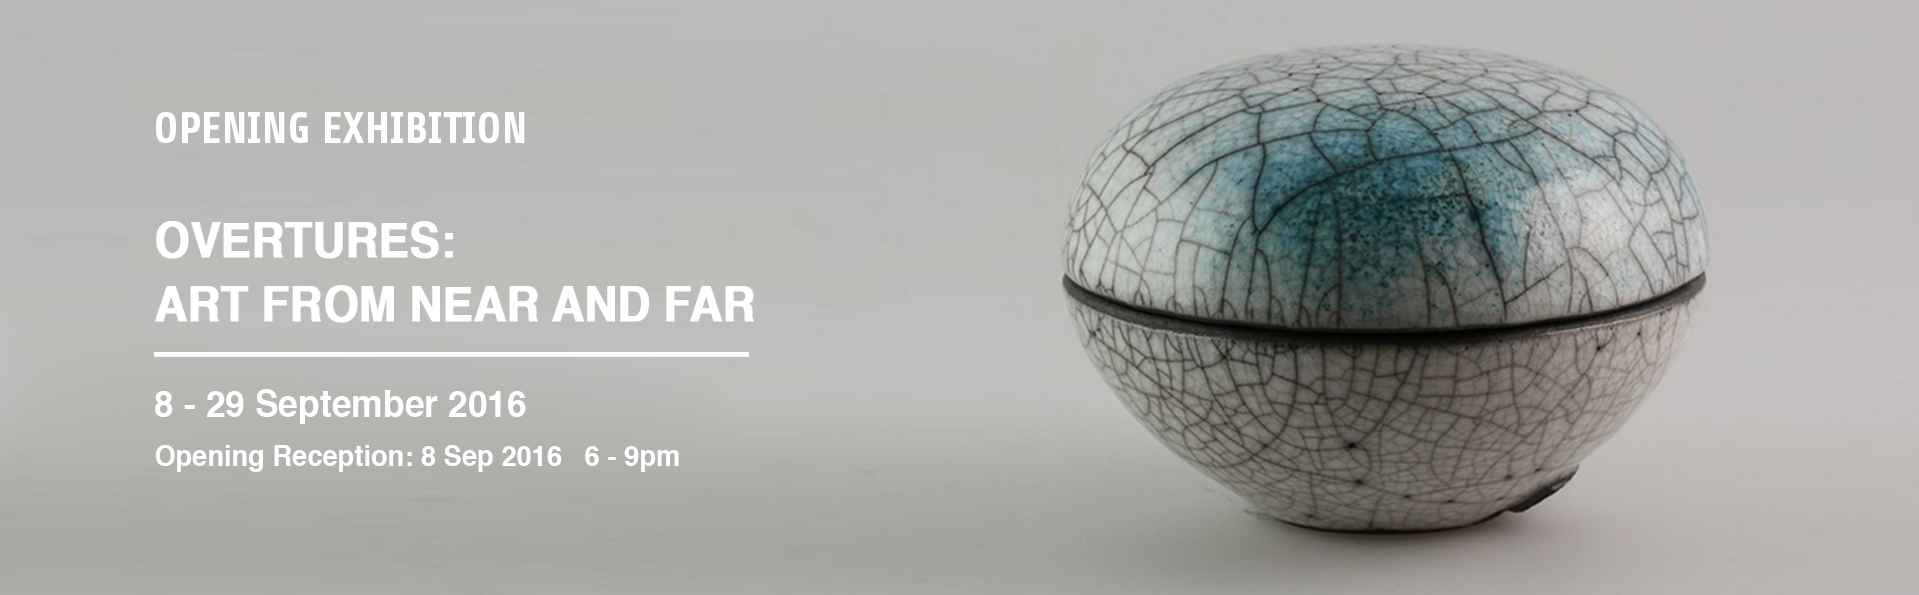 overture art exhibitions london